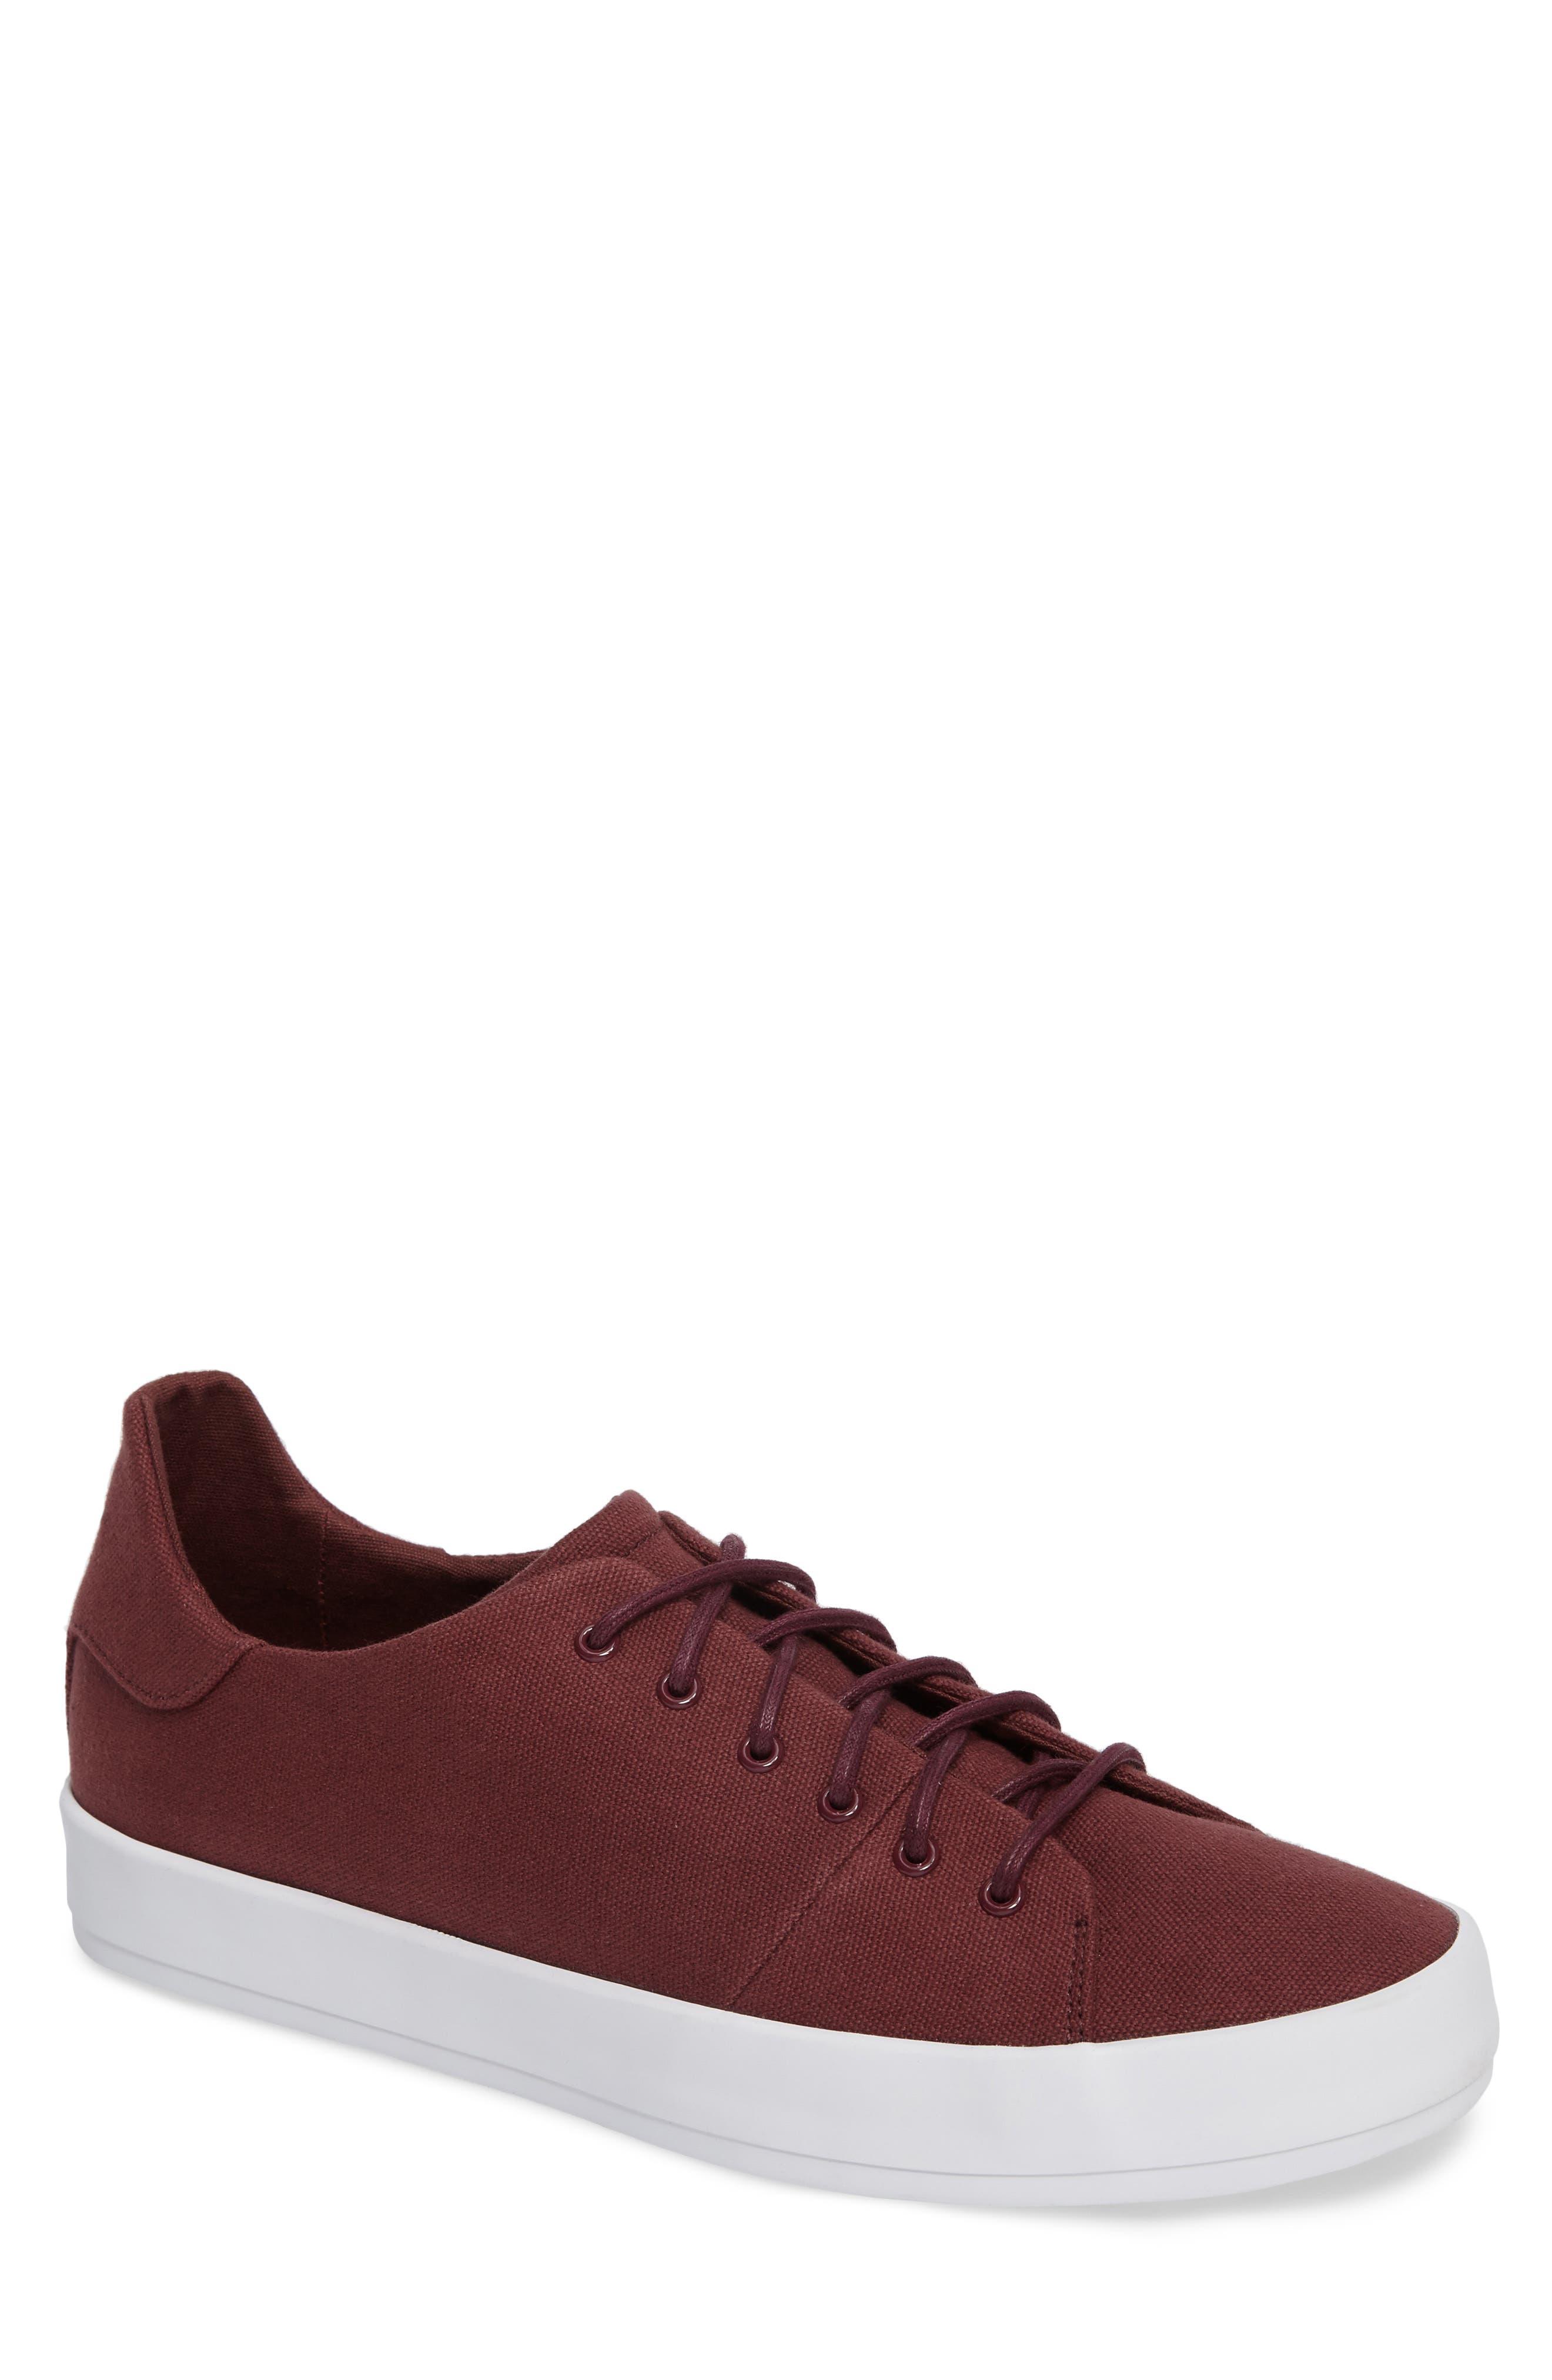 Creative Recreation Carda Low Top Sneaker (Men)